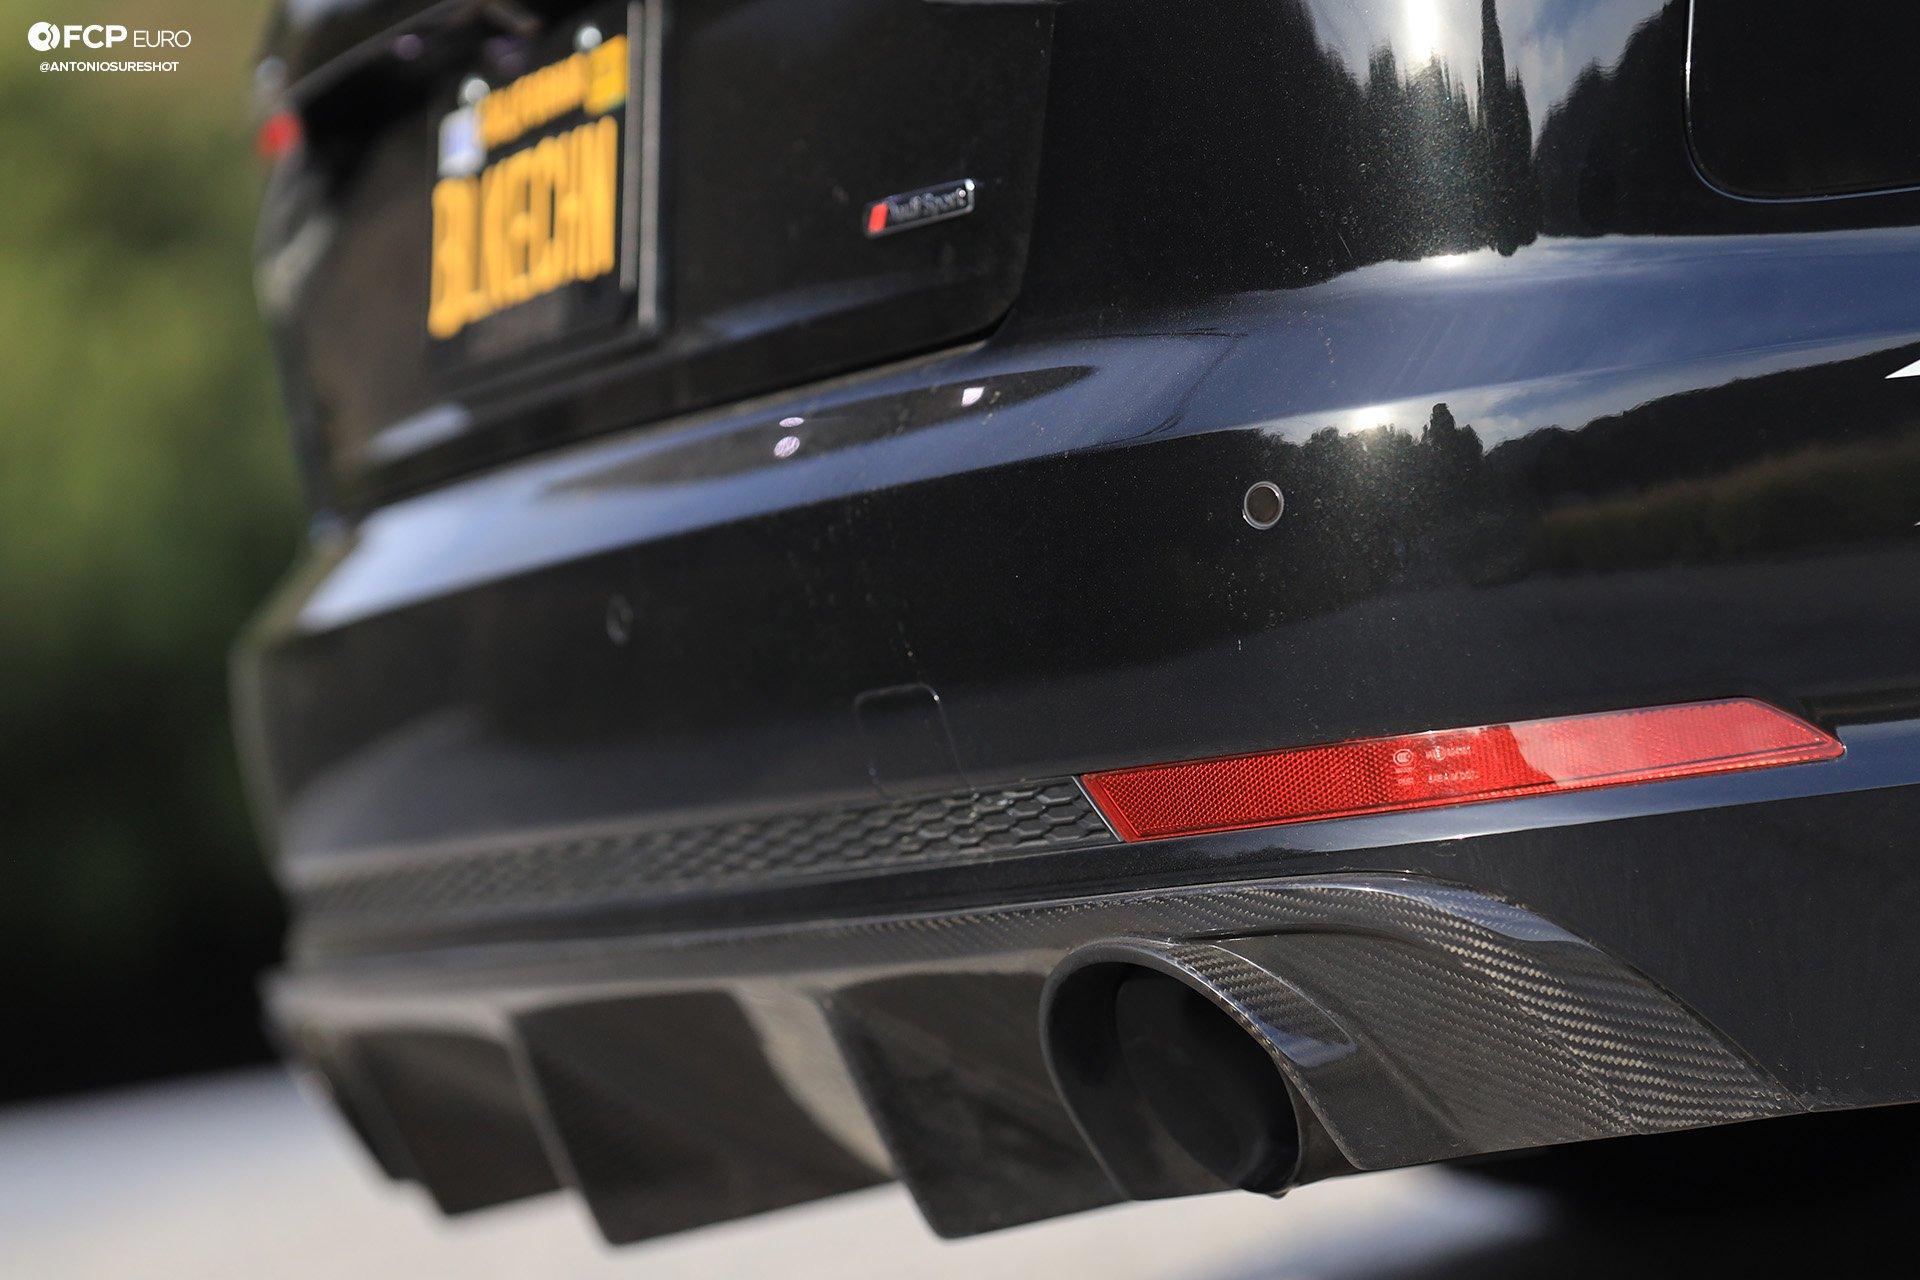 034 Motorsport Moss Motorsport B9 Audi A4 6spd Manual EOSR0943 crop